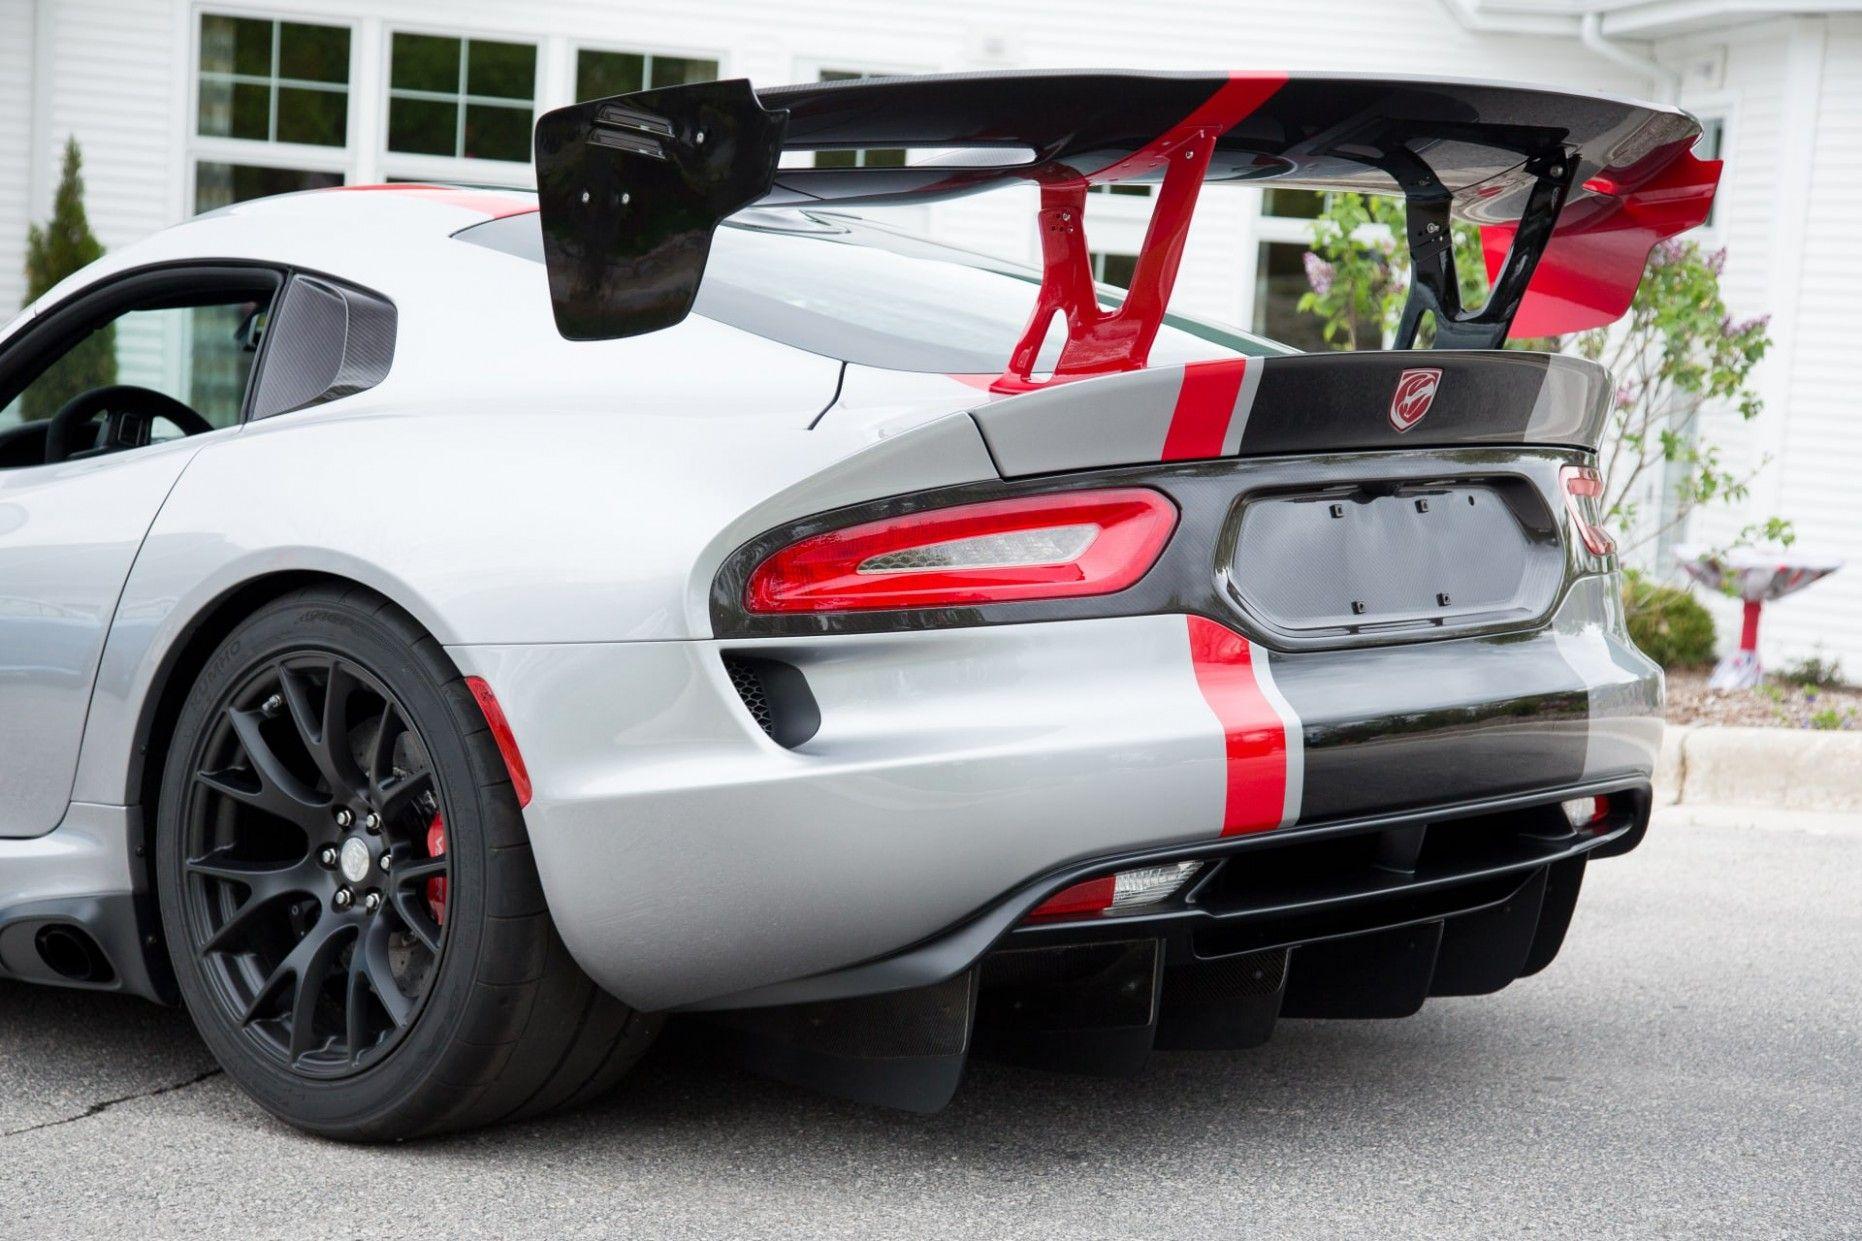 Pin by John Hassemer on Vehicles | Dodge viper, Viper acr